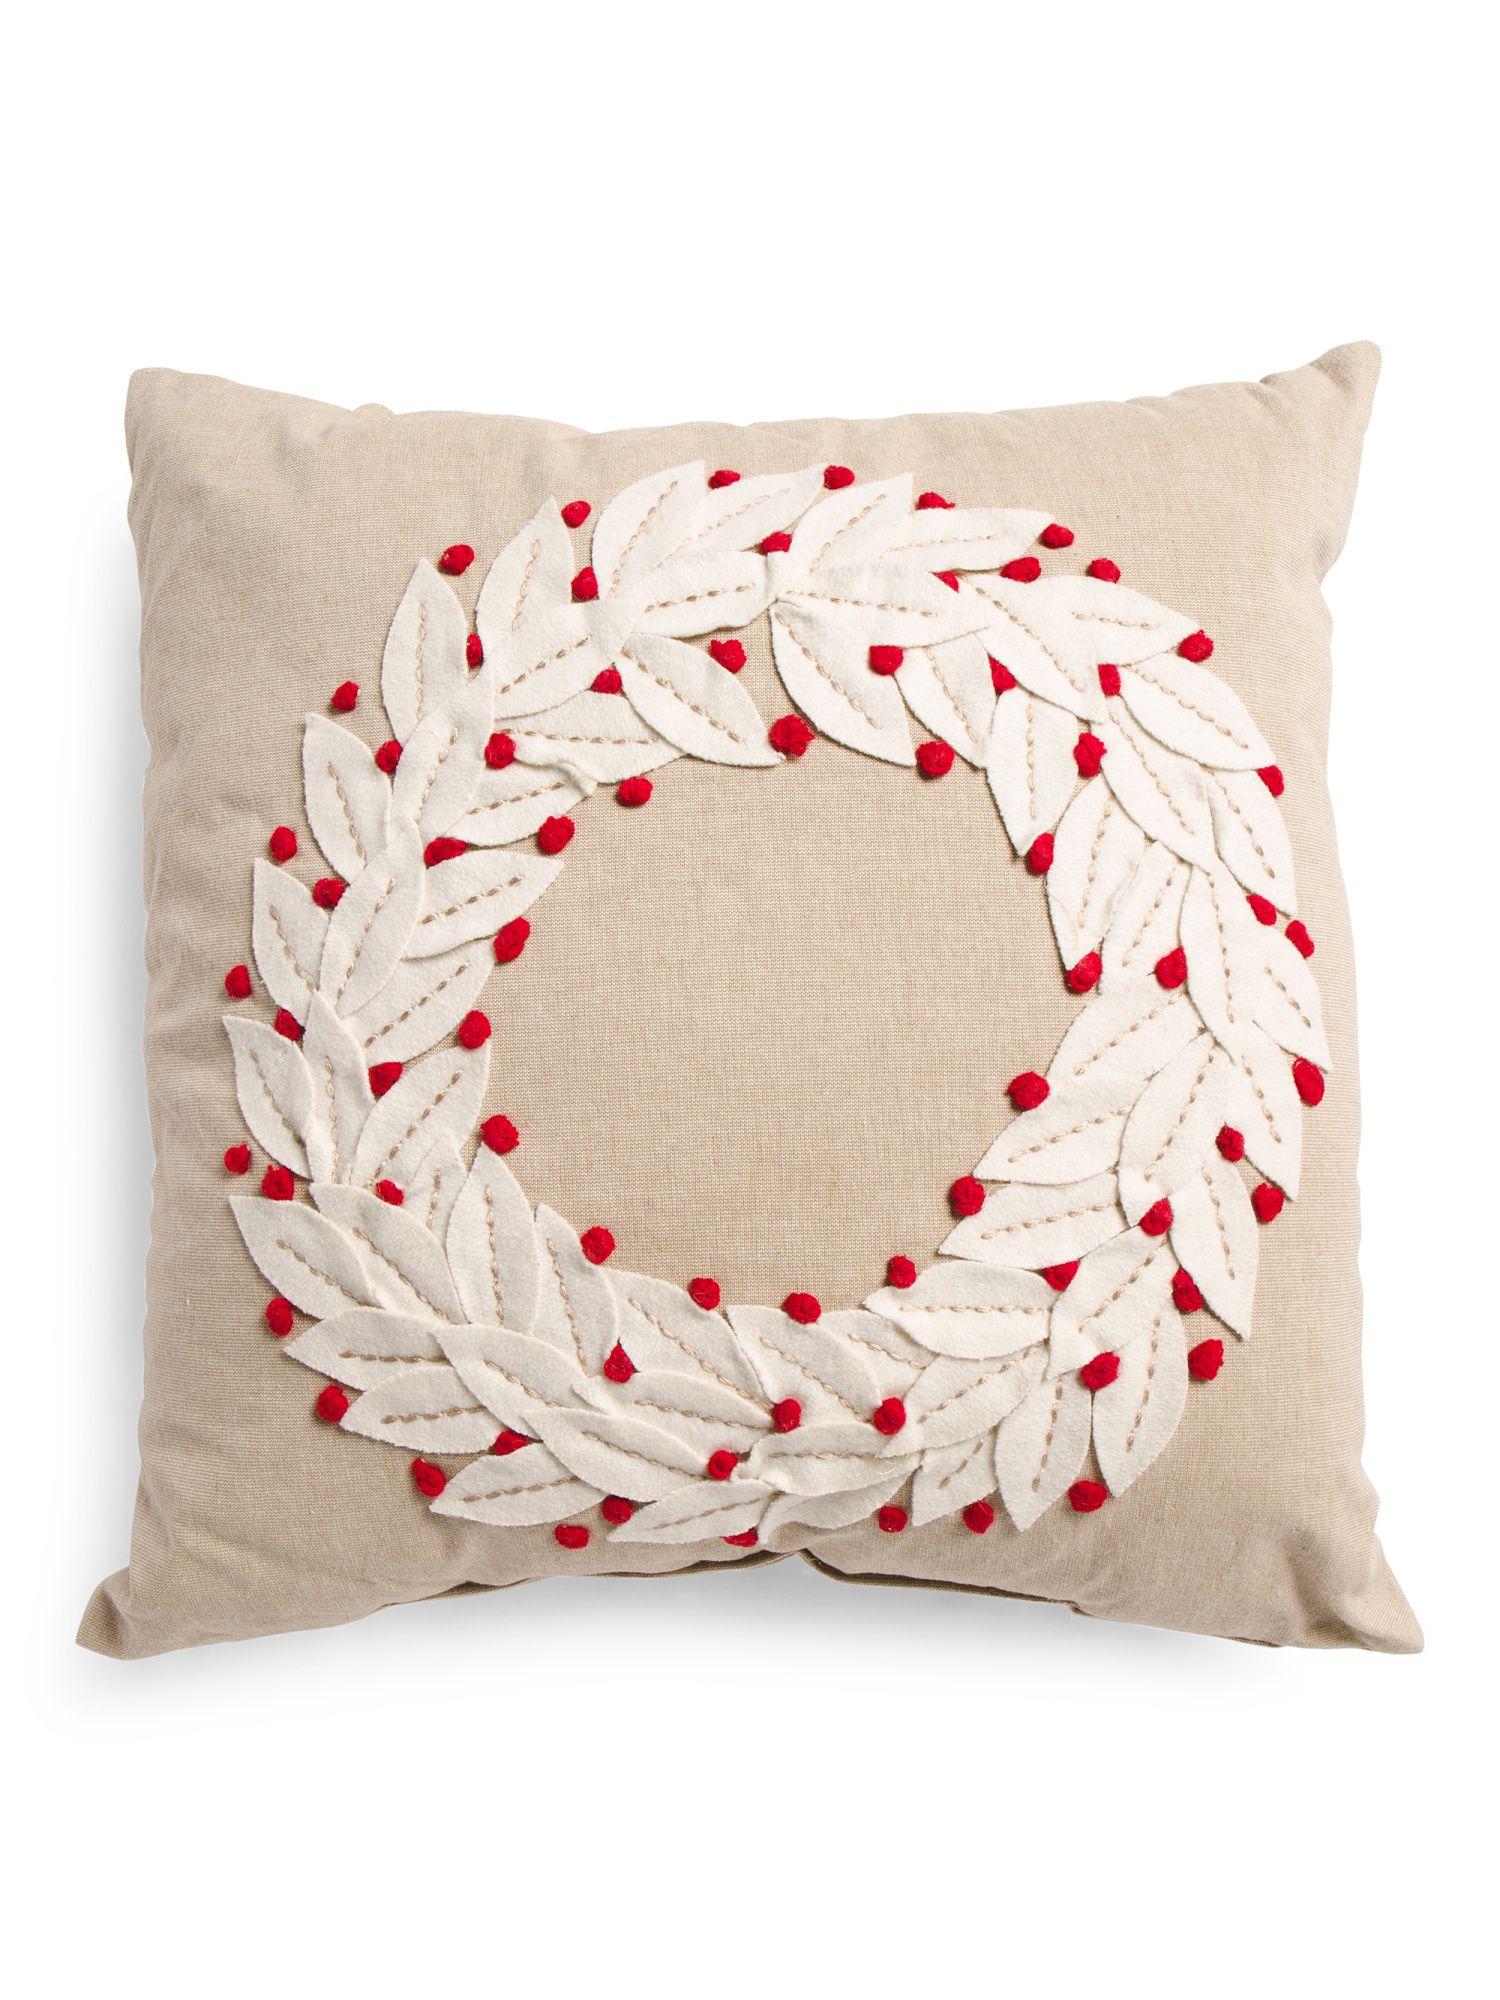 High Resolution Image Knot Pillow Pillows Throw Pillows